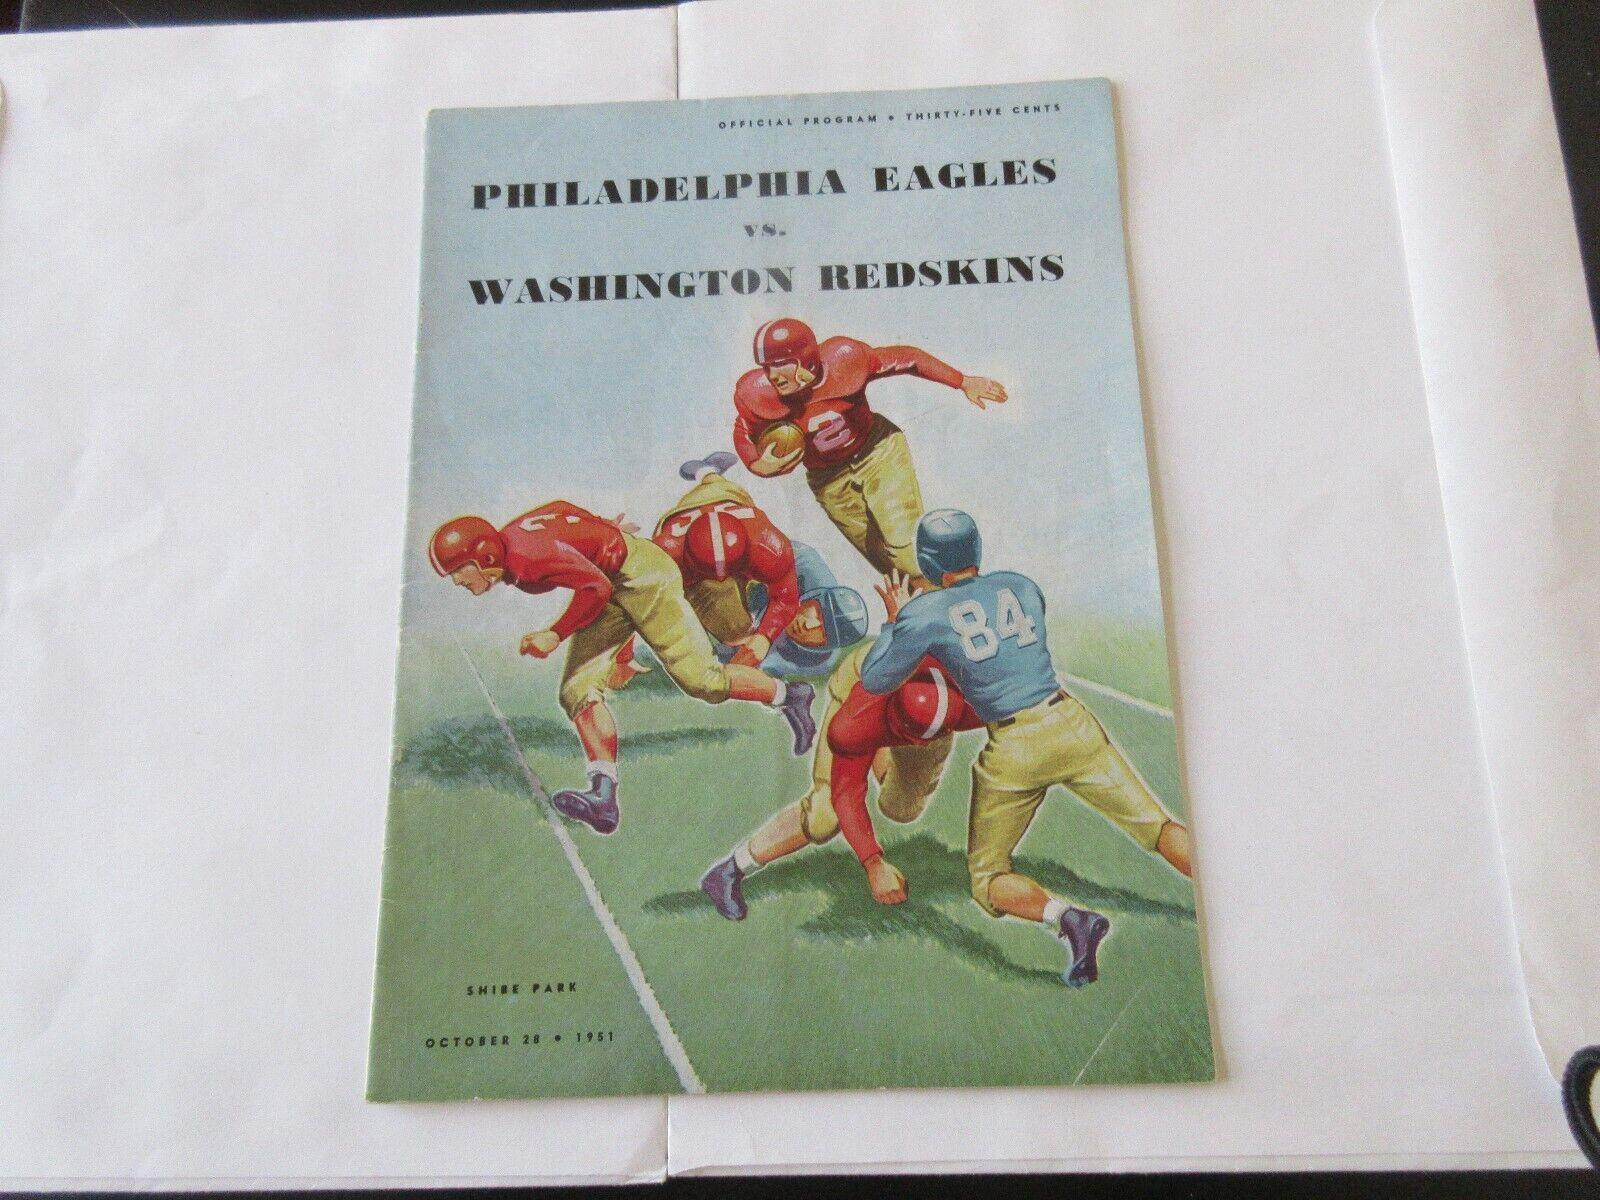 Philadelphia Eagles vs. Washington Redskins , Official